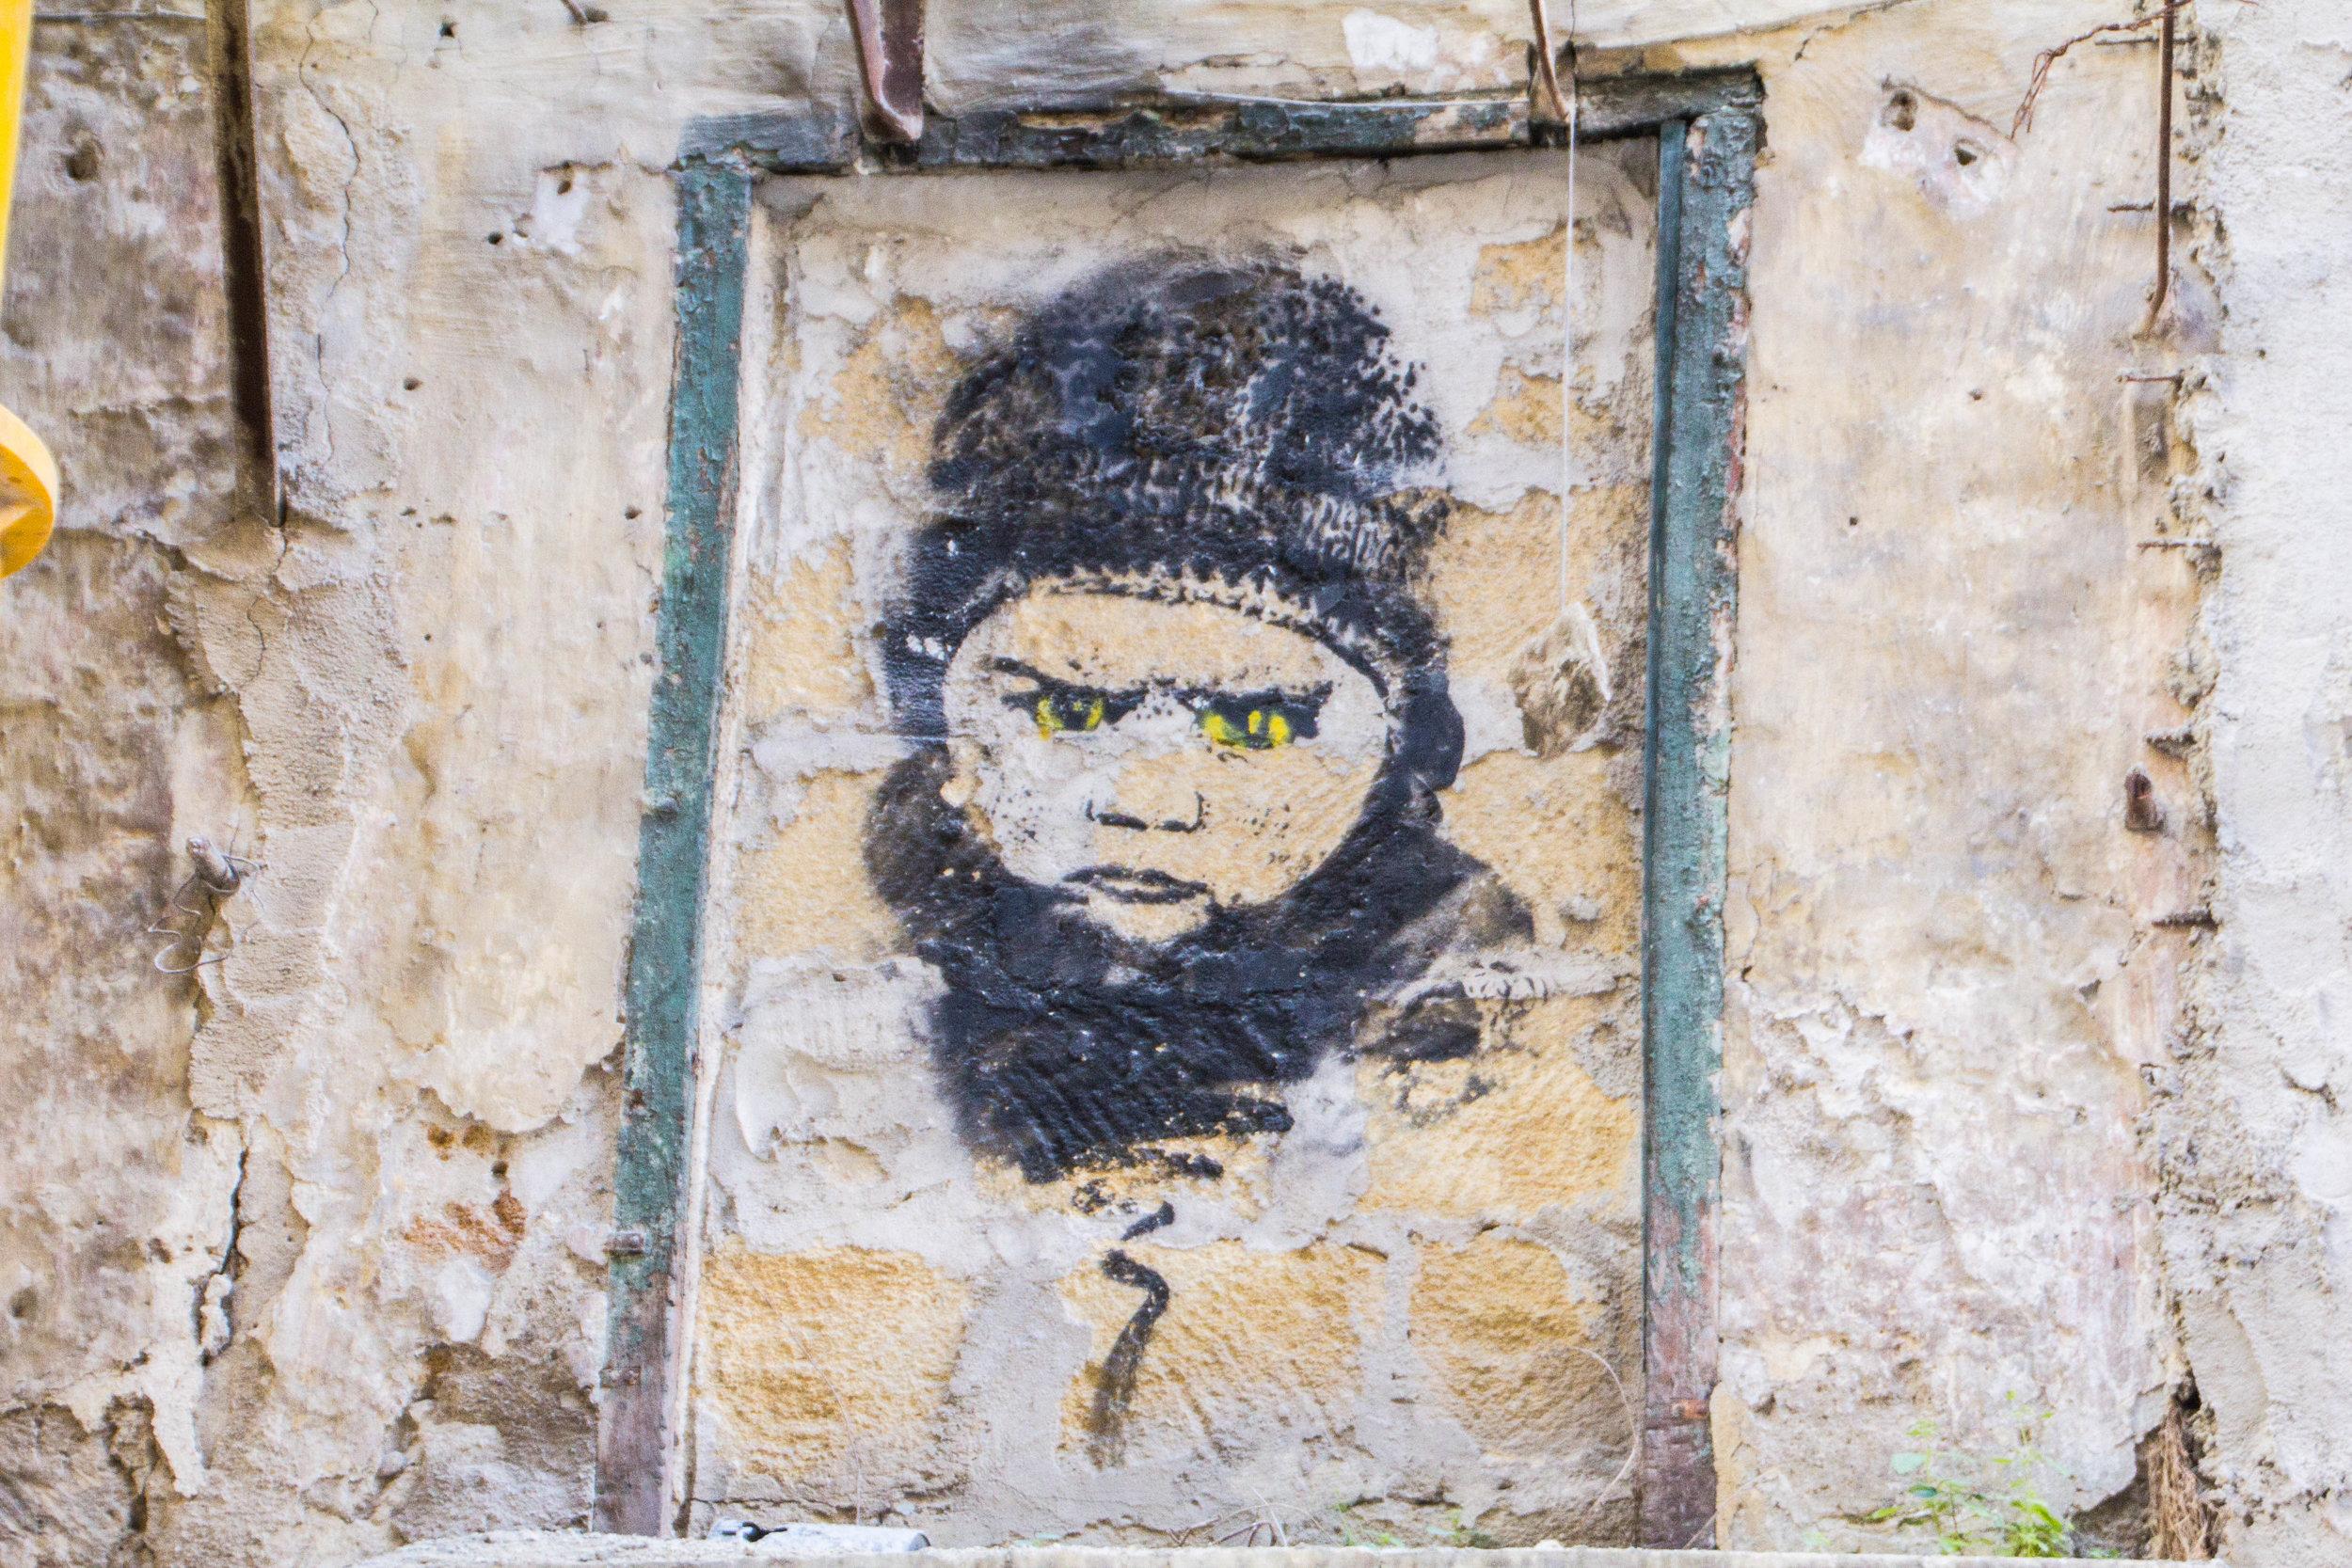 street-art-palermo-sicily-42.jpg